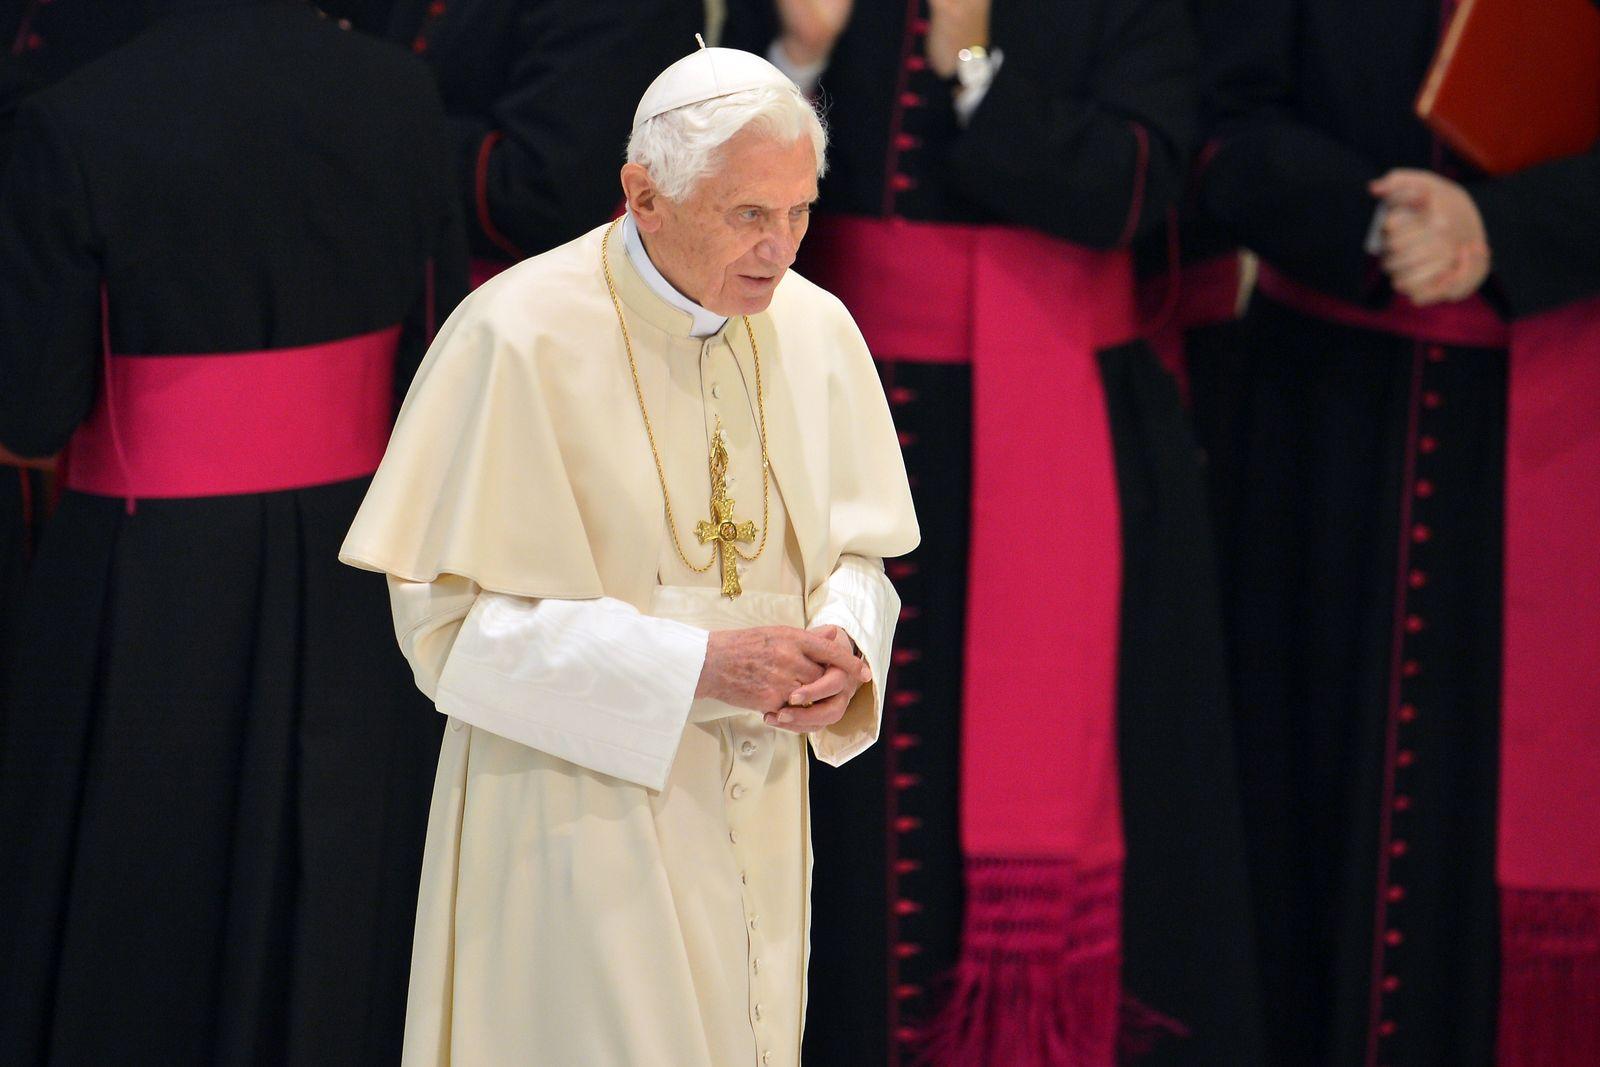 Papst / betroffen